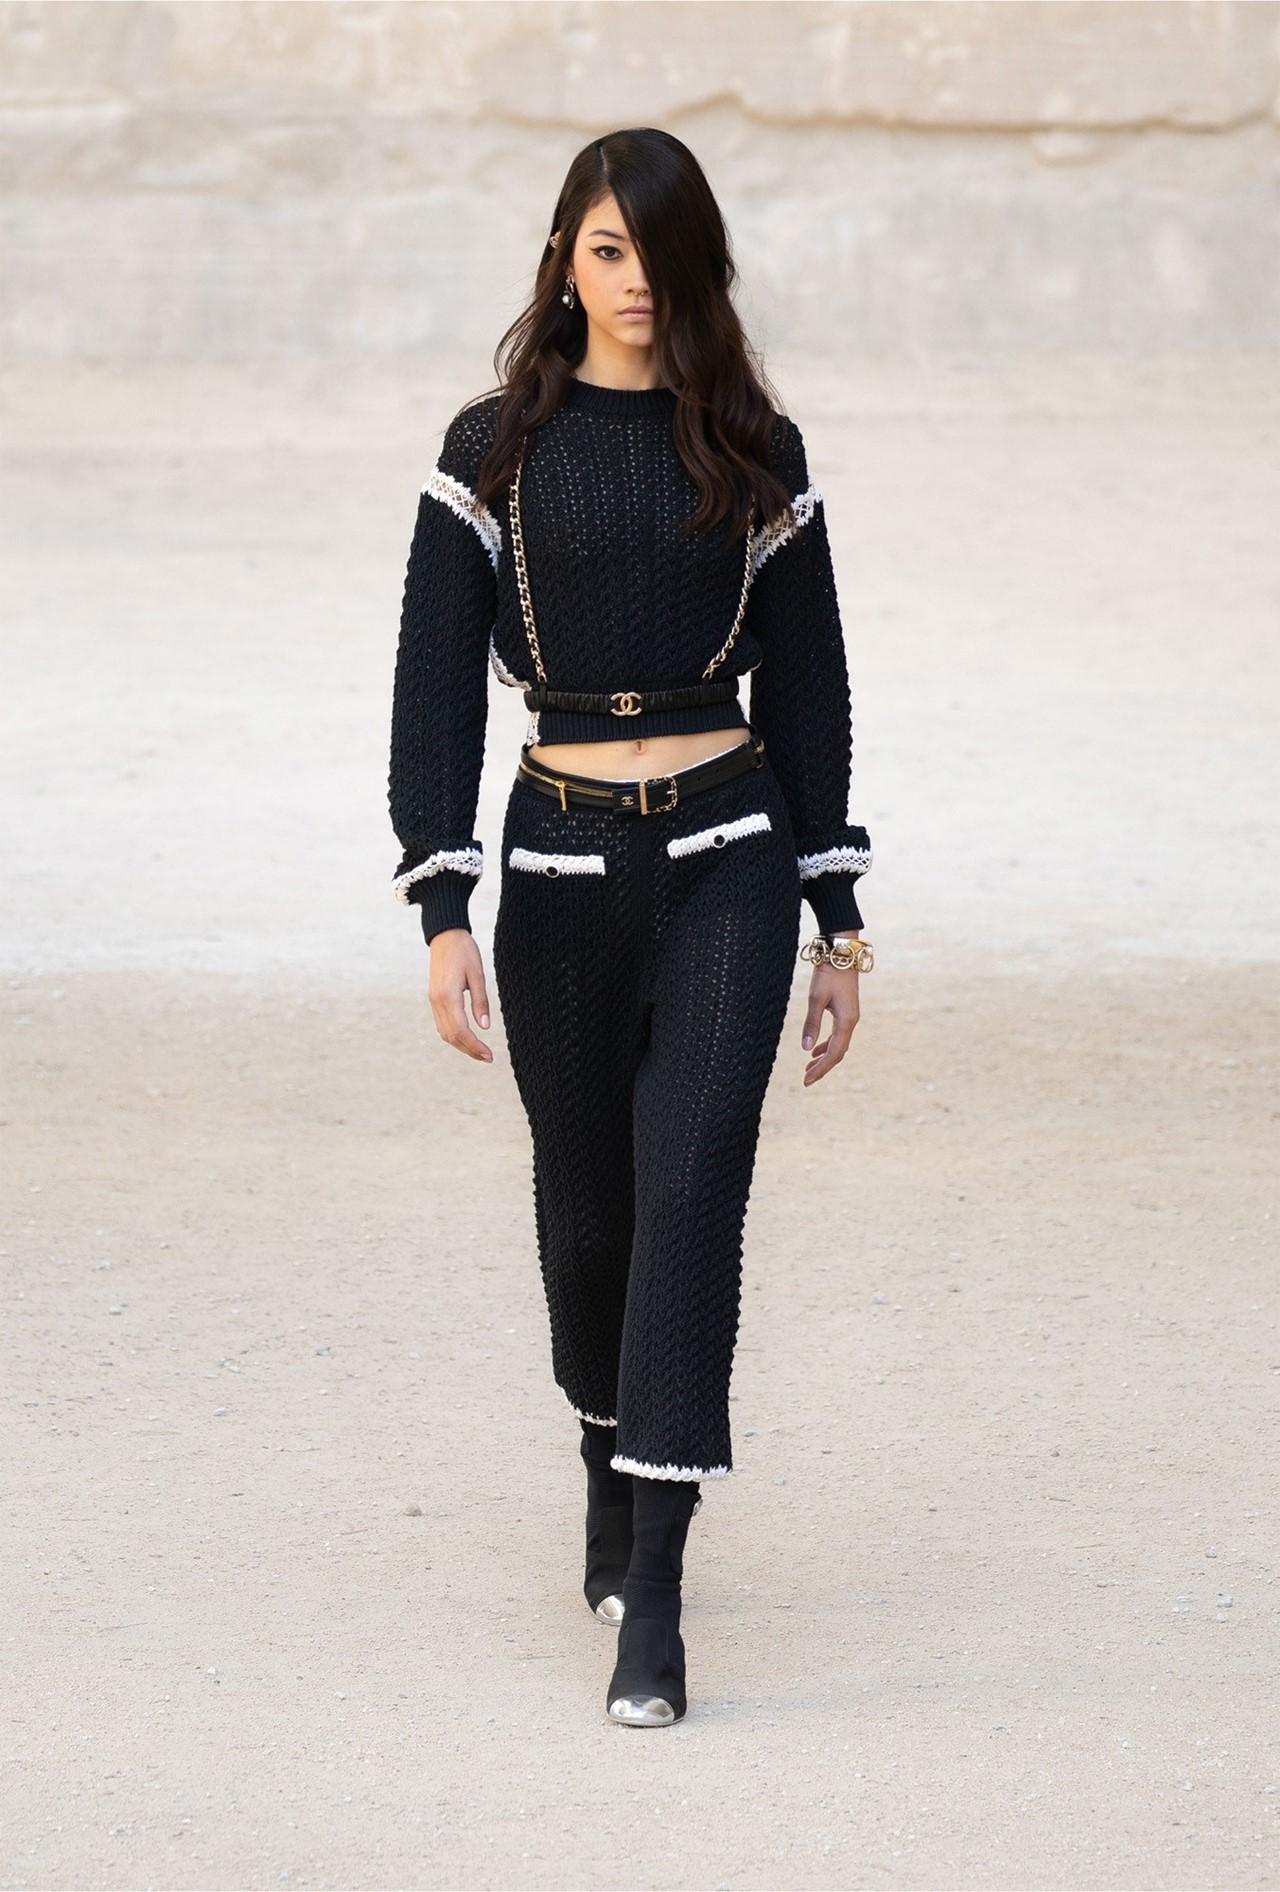 Chanel_Cruise_2022_Fashionela (30)